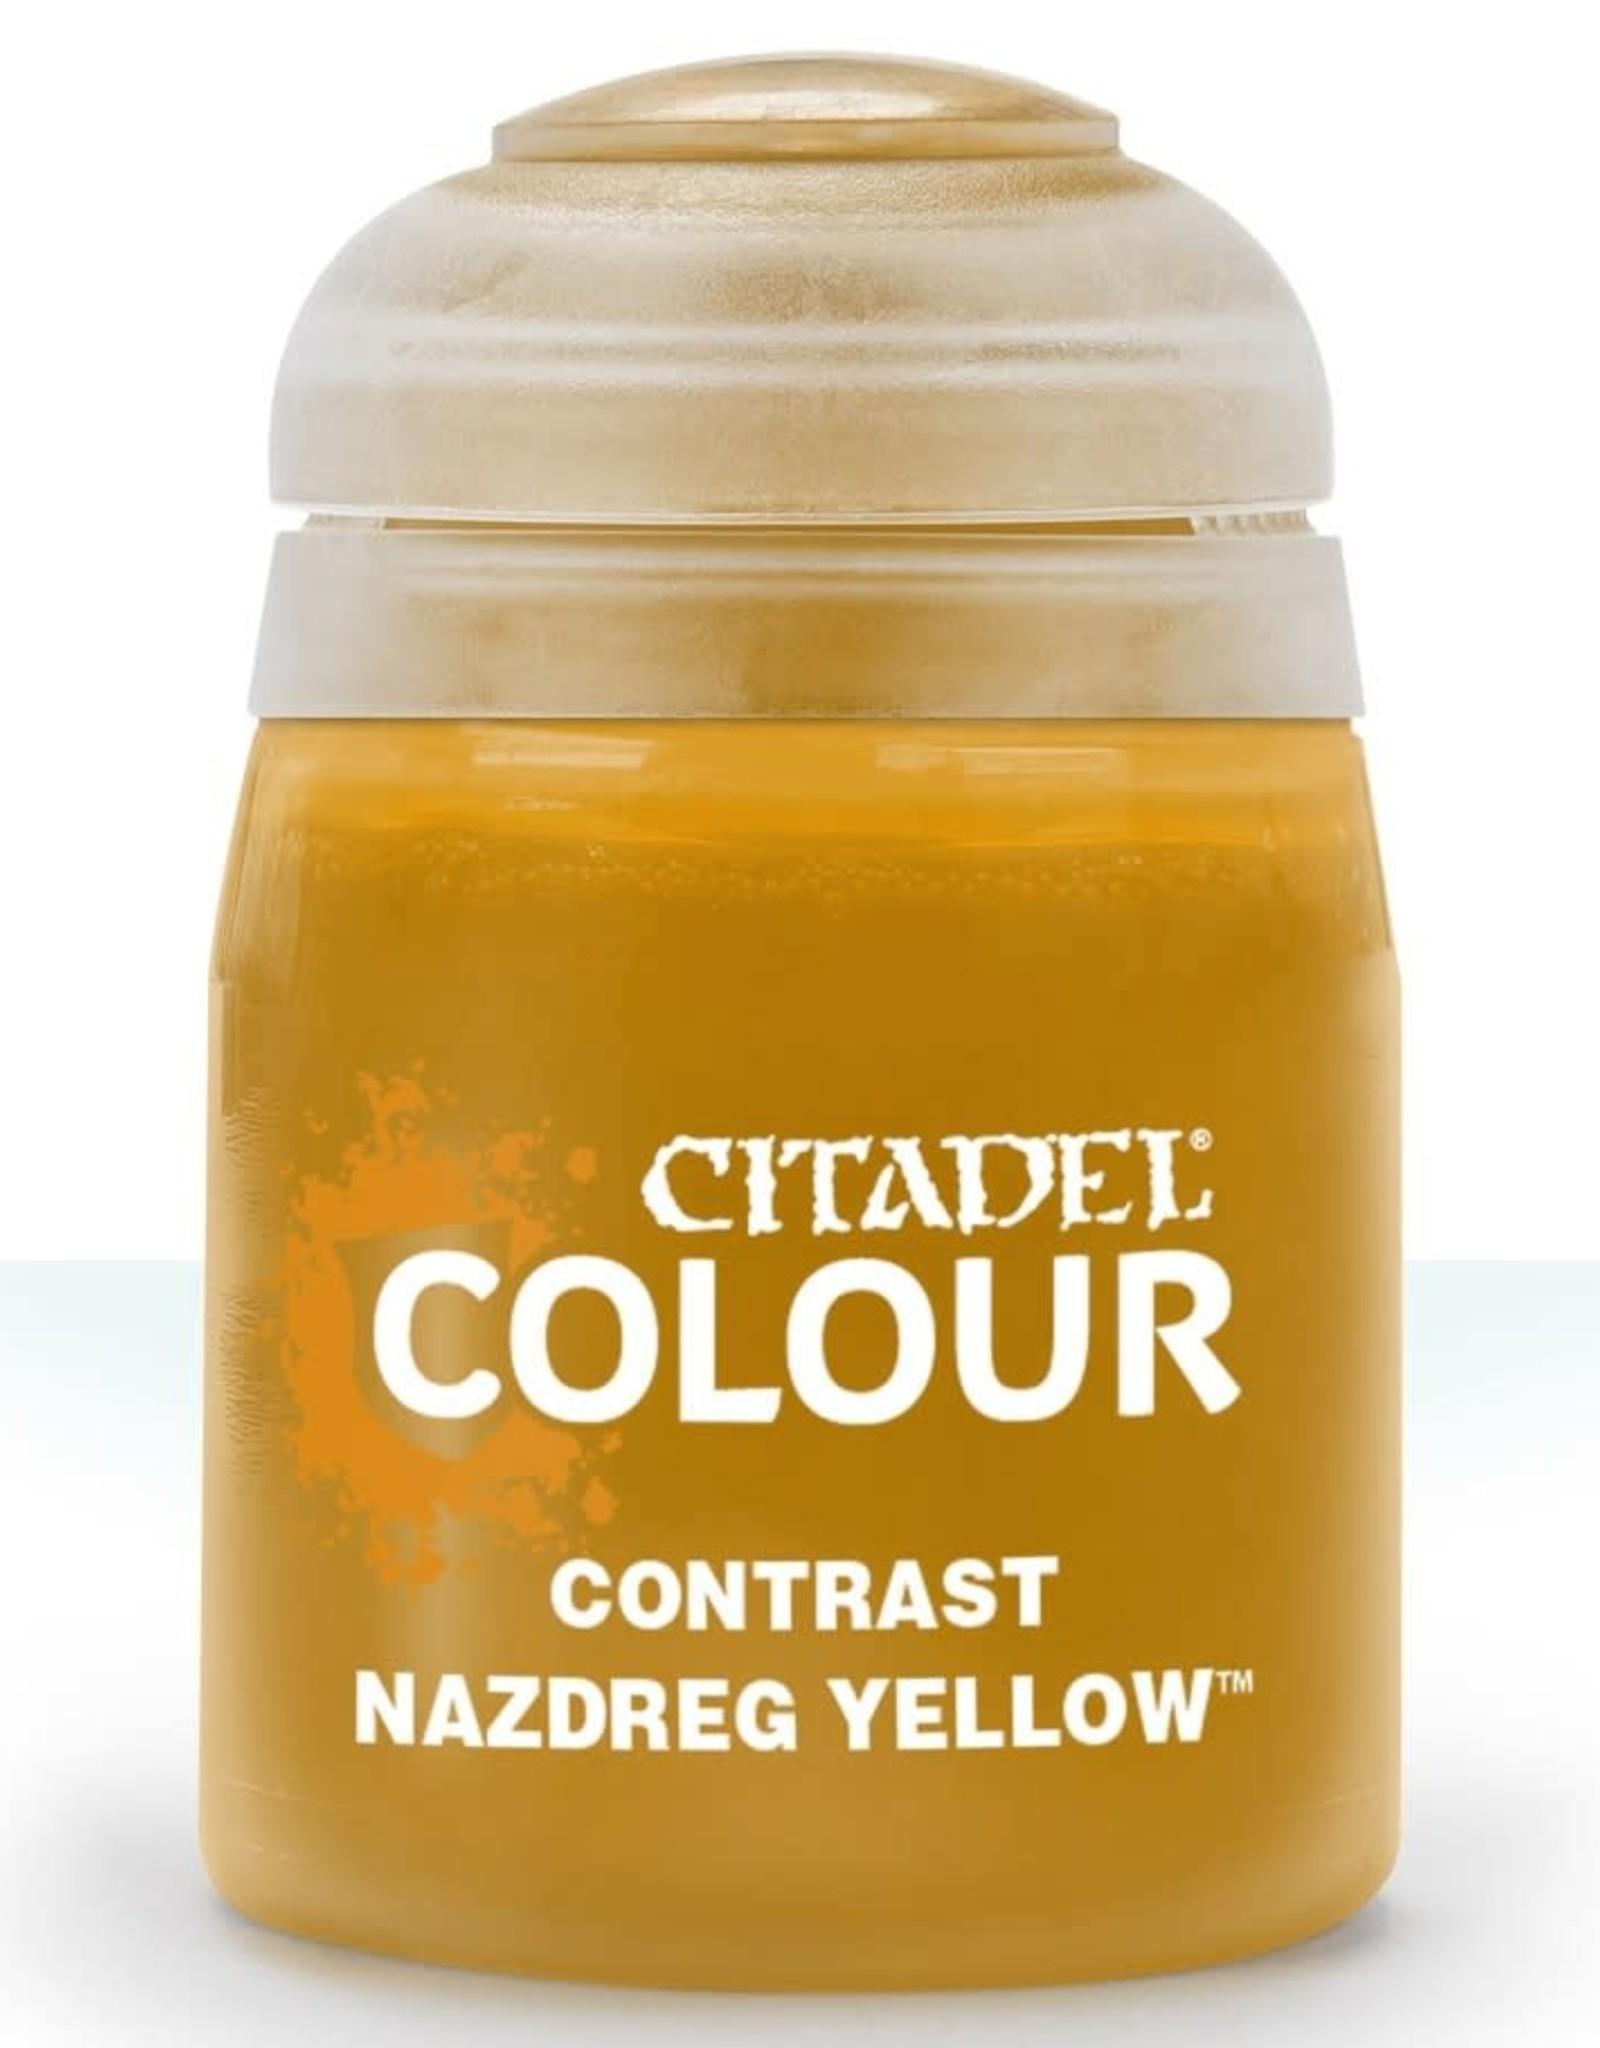 Citadel Contrast Paint: Nazdreg Yellow